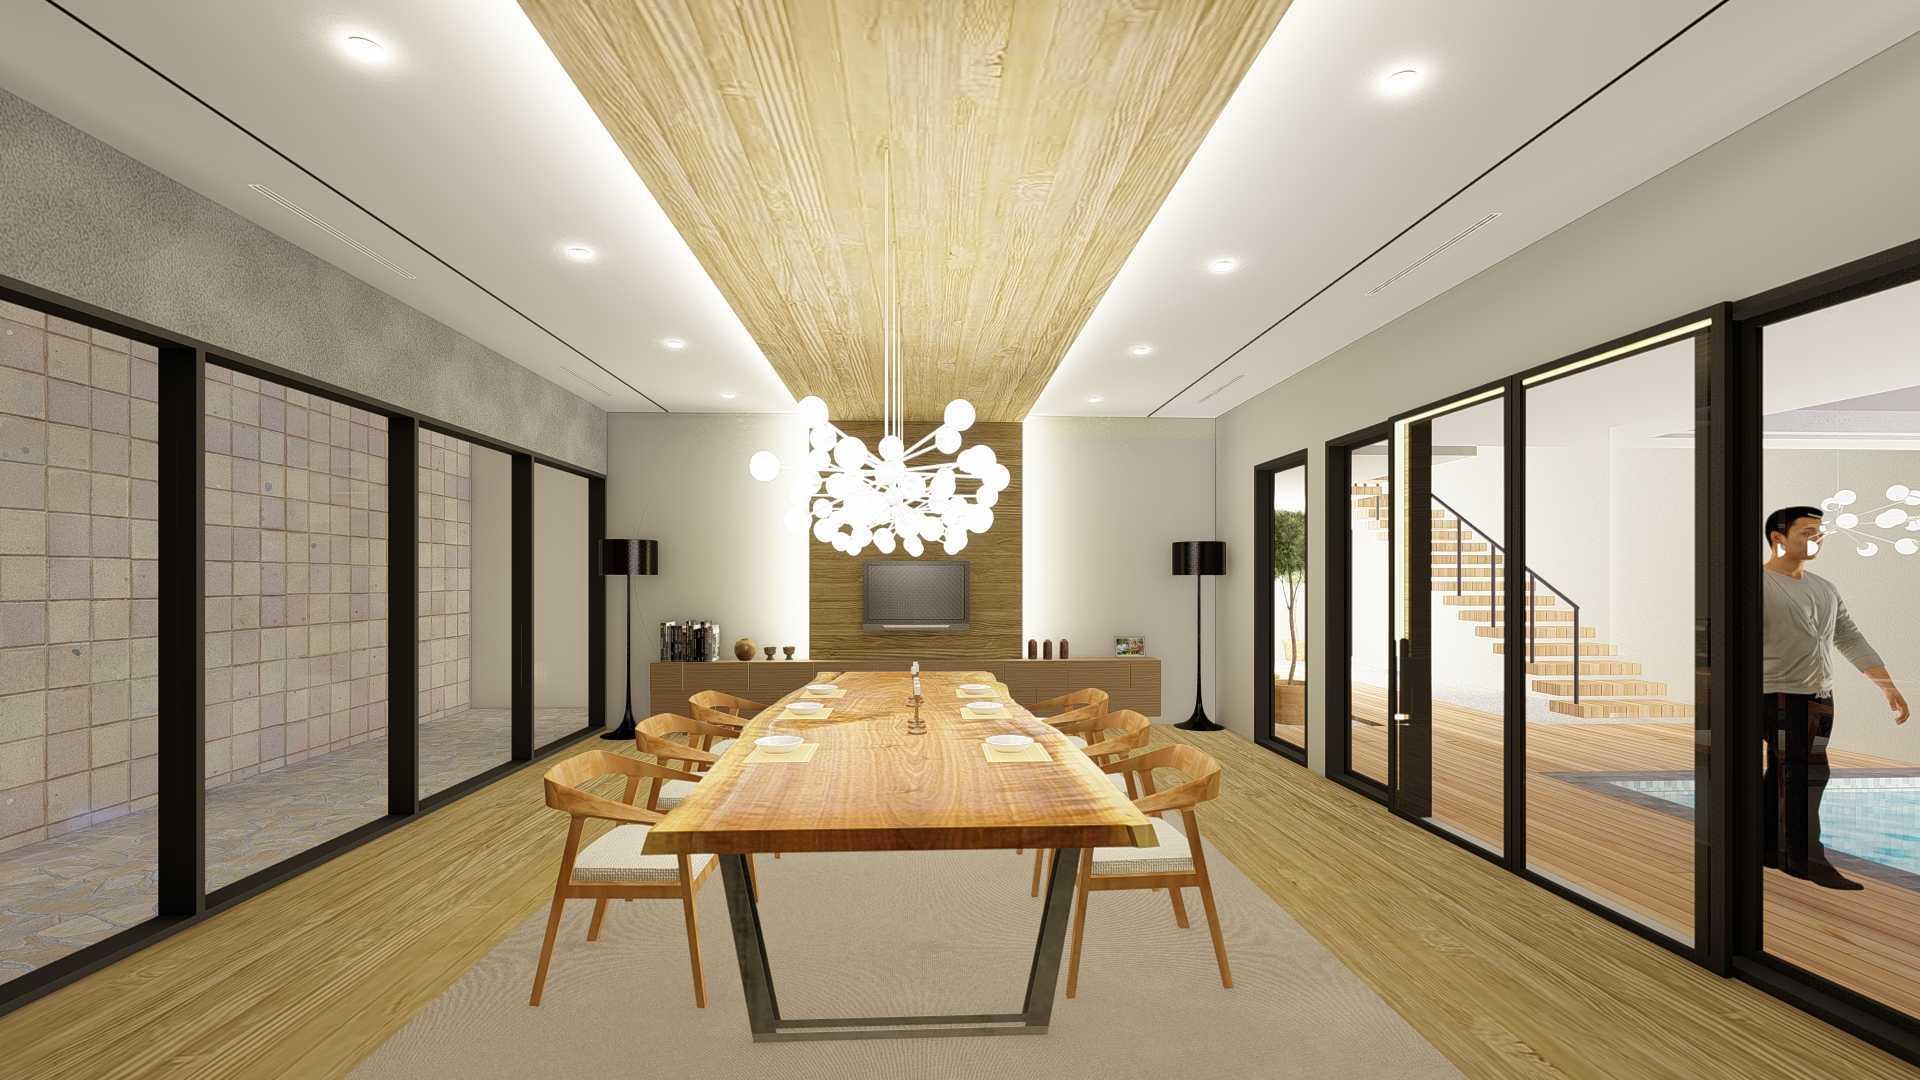 Raaj Gill Arsitek Terrace House Jakarta, Daerah Khusus Ibukota Jakarta, Indonesia Jakarta, Daerah Khusus Ibukota Jakarta, Indonesia Raaj-Gill-Arsitek-Terrace-House   74873